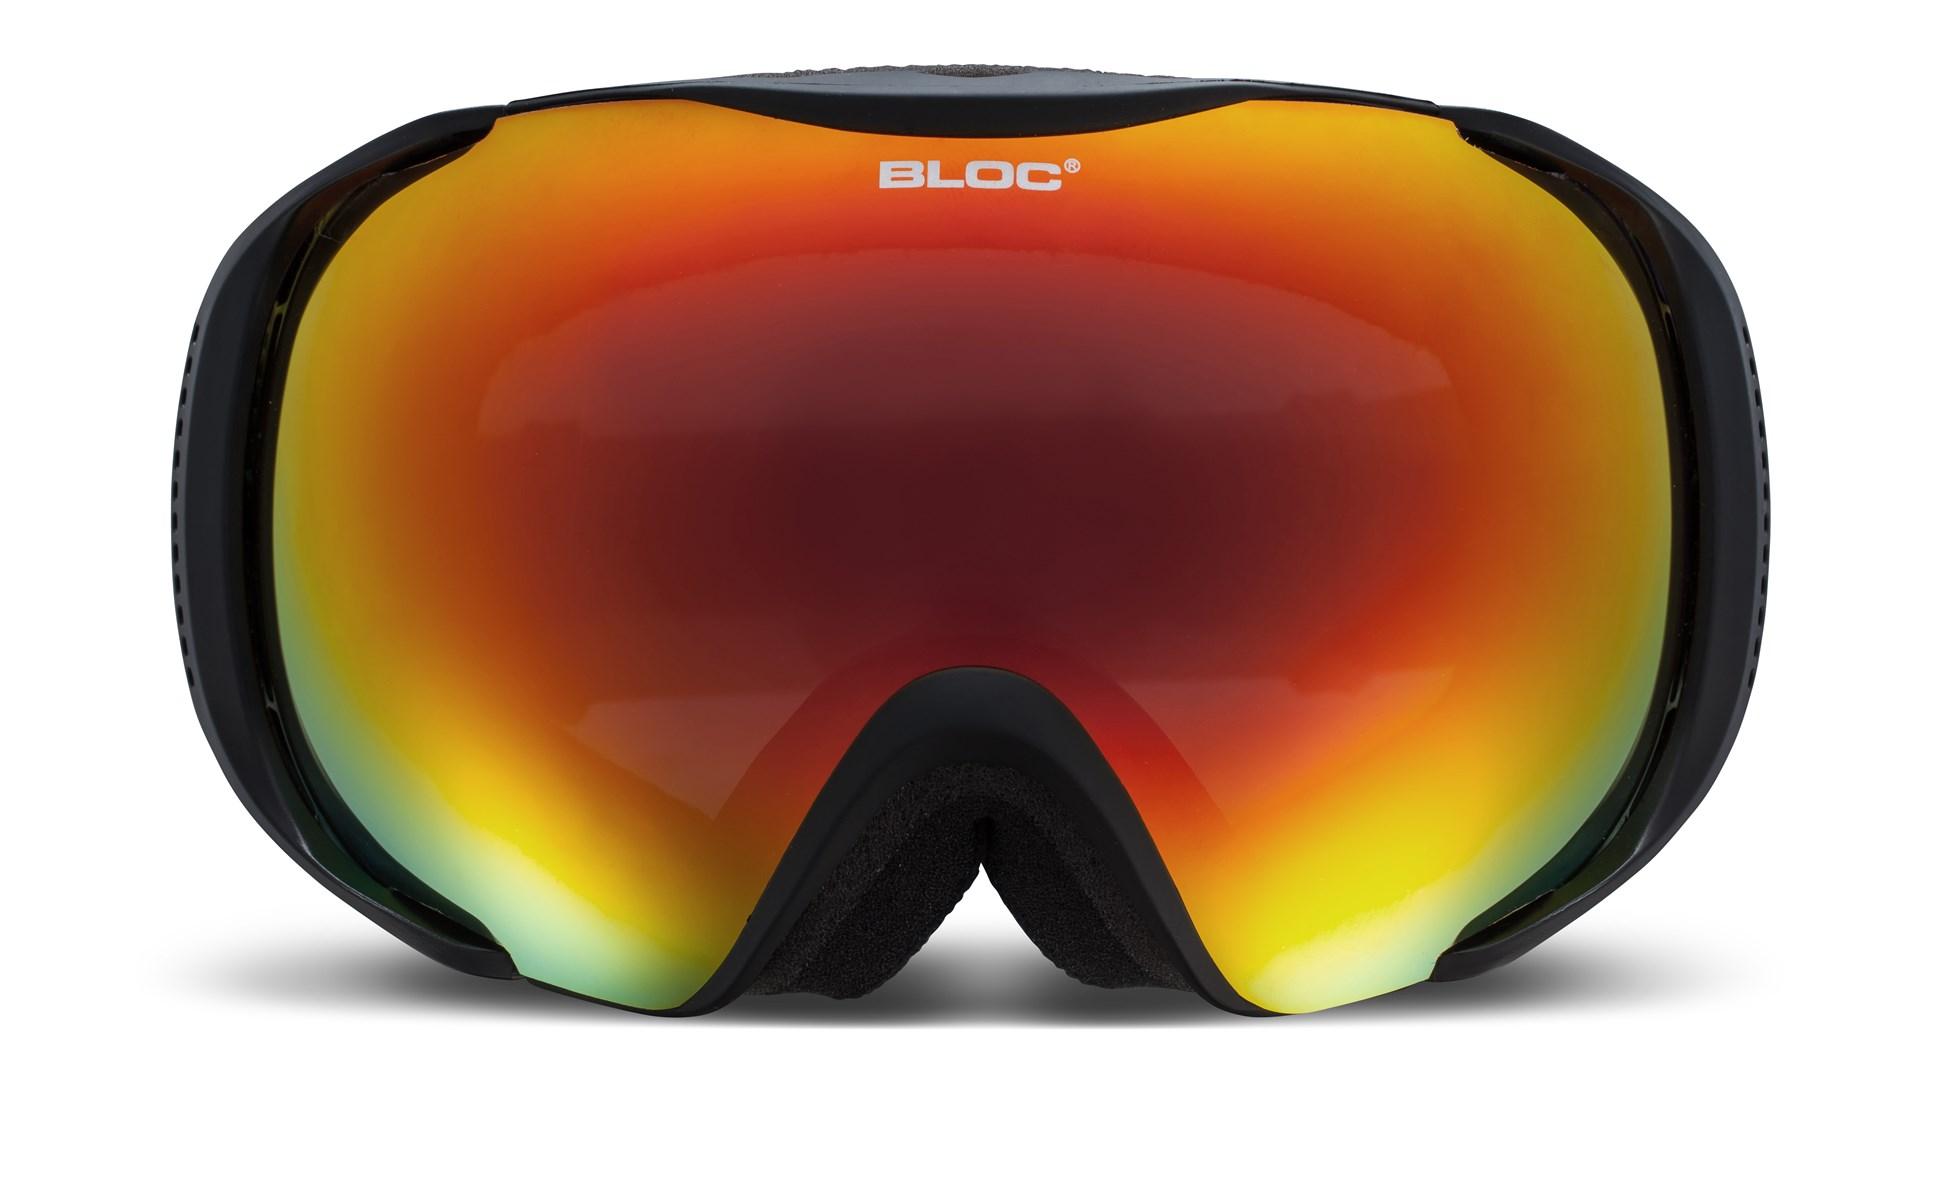 cf354dfdce98 Bloc Mask Ski Goggles Matt Black with Revo Red Mirror Lens £45.00